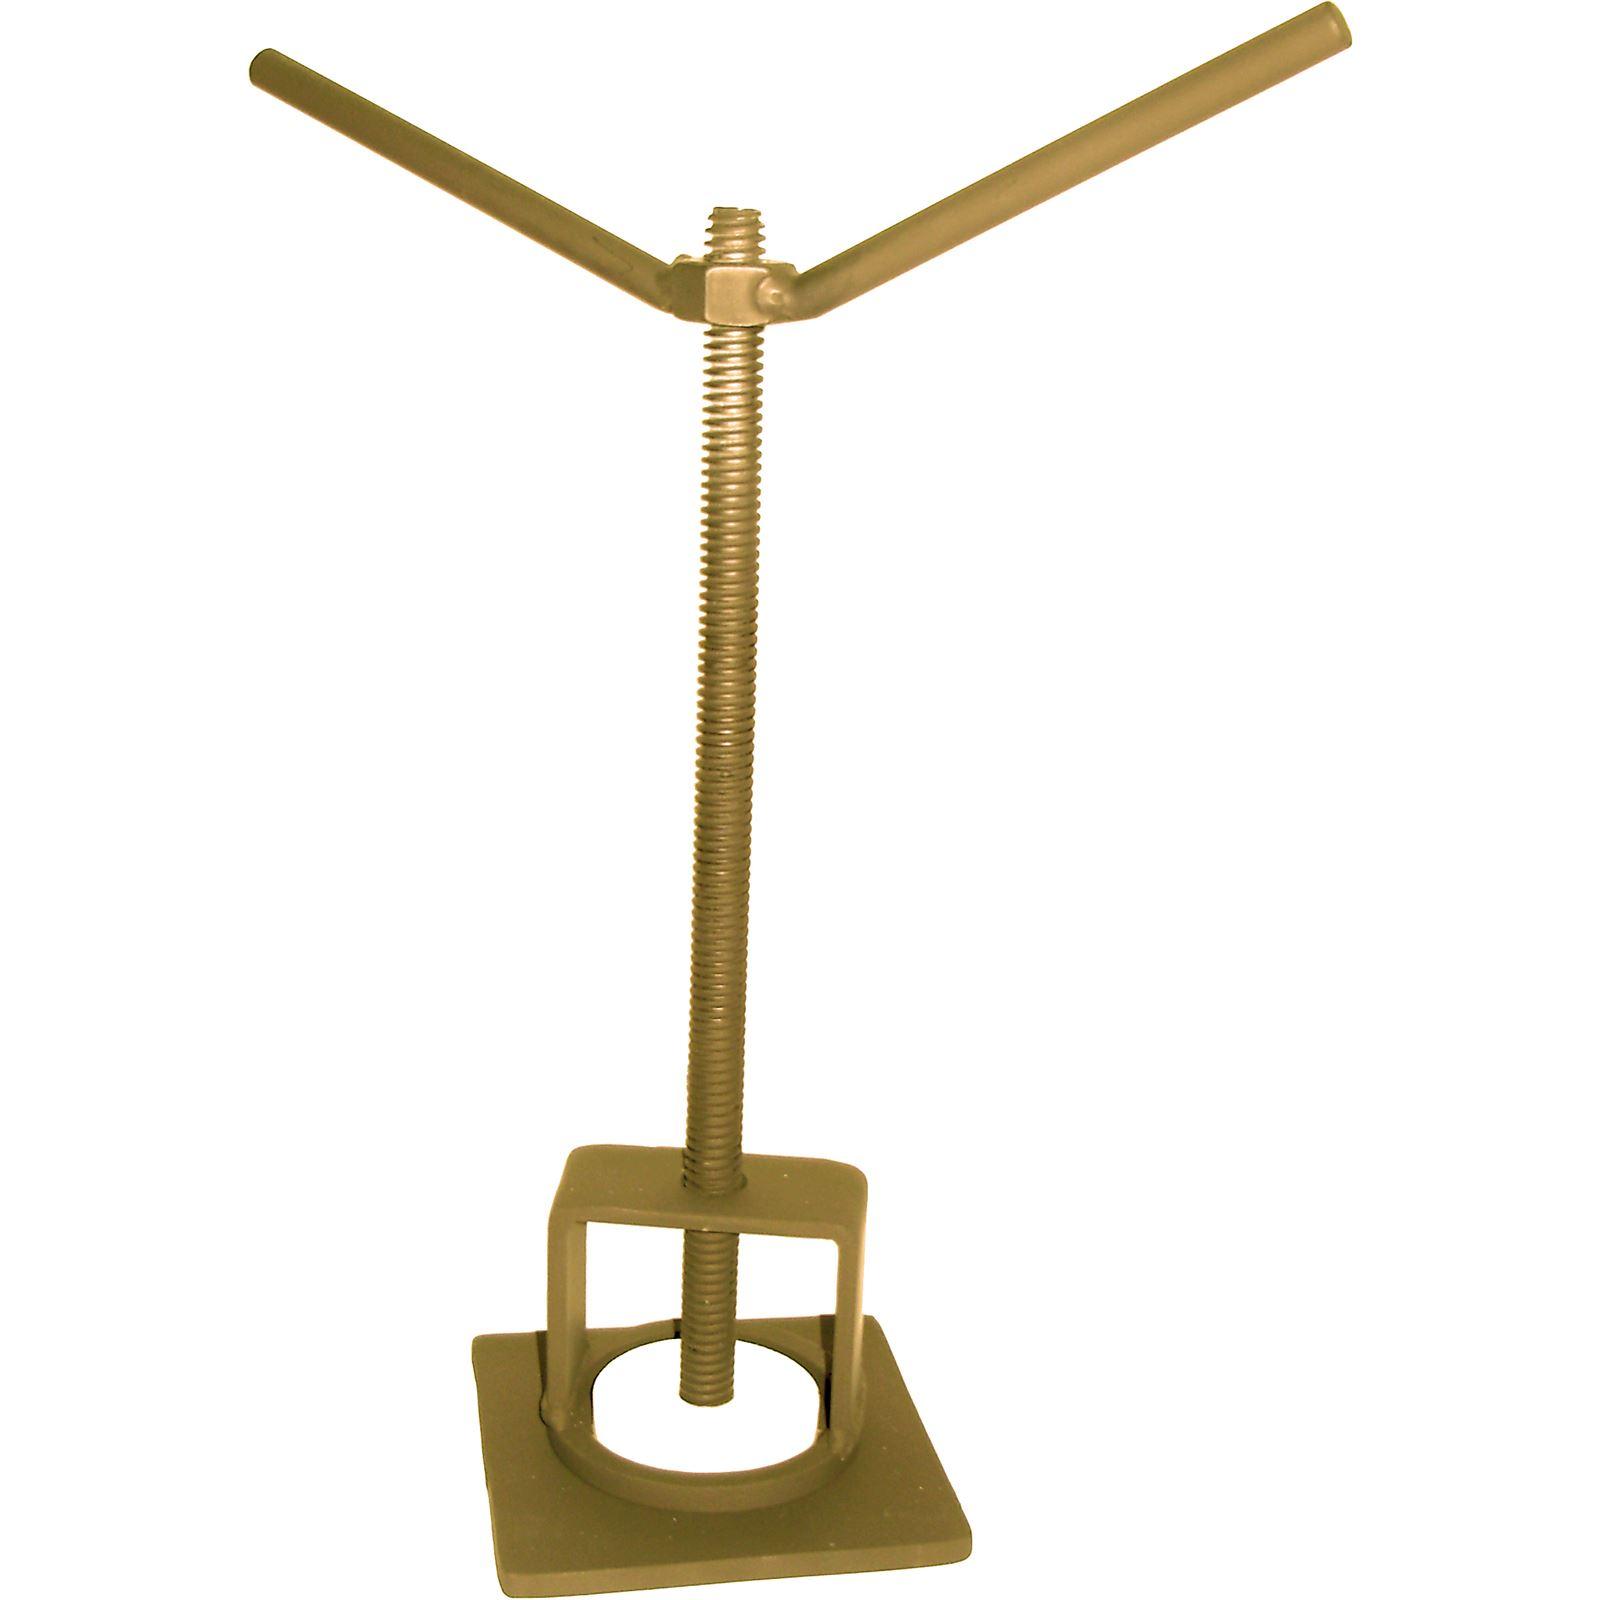 Straightline Universal Clutch Spring Compressor